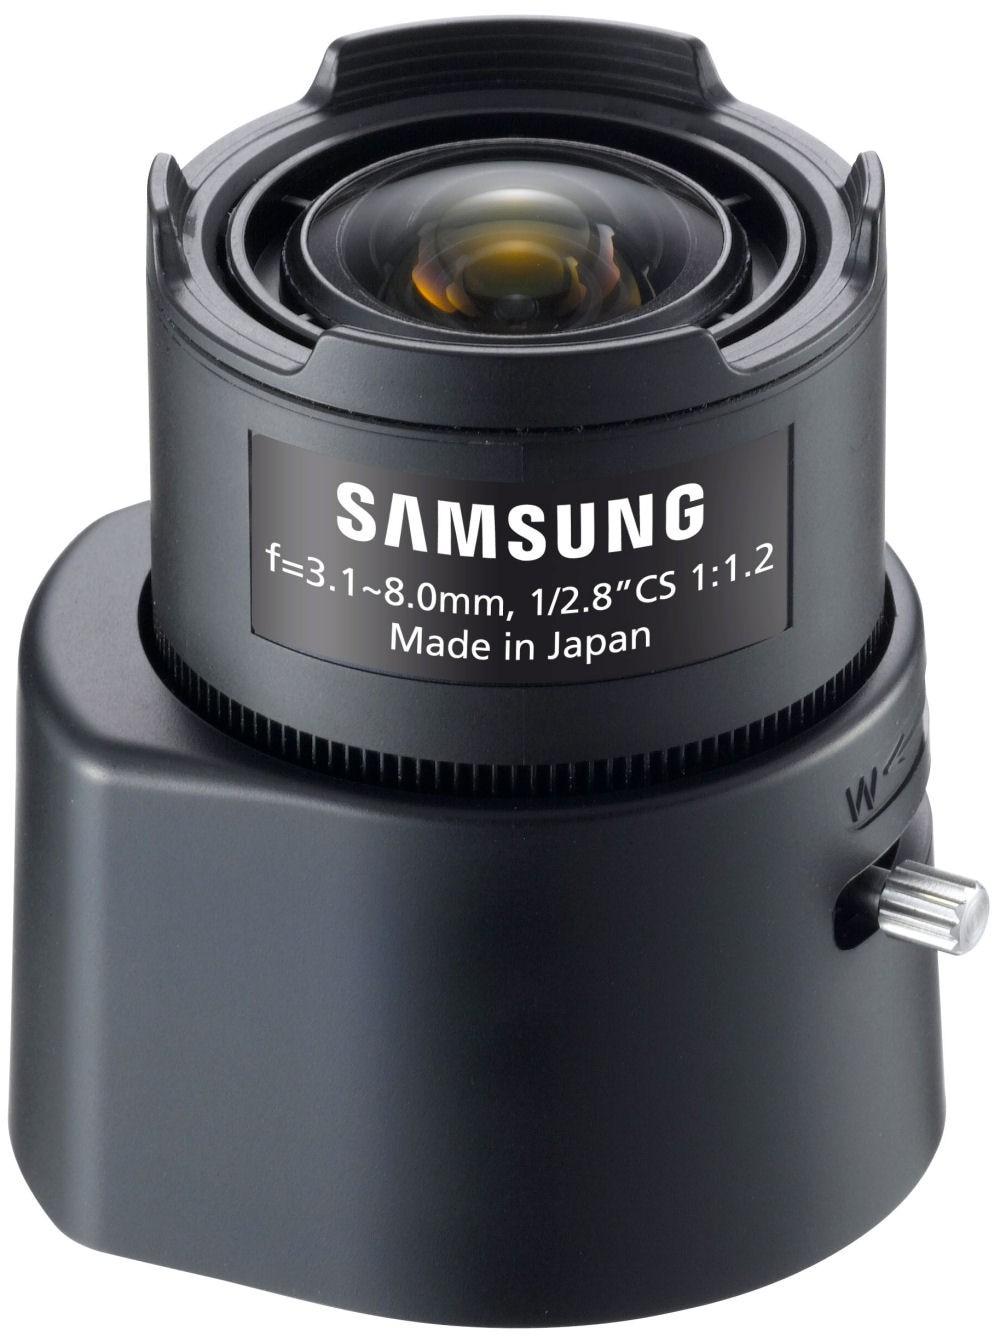 Samsung SLAM3180PN Mega Pixel IP Lens